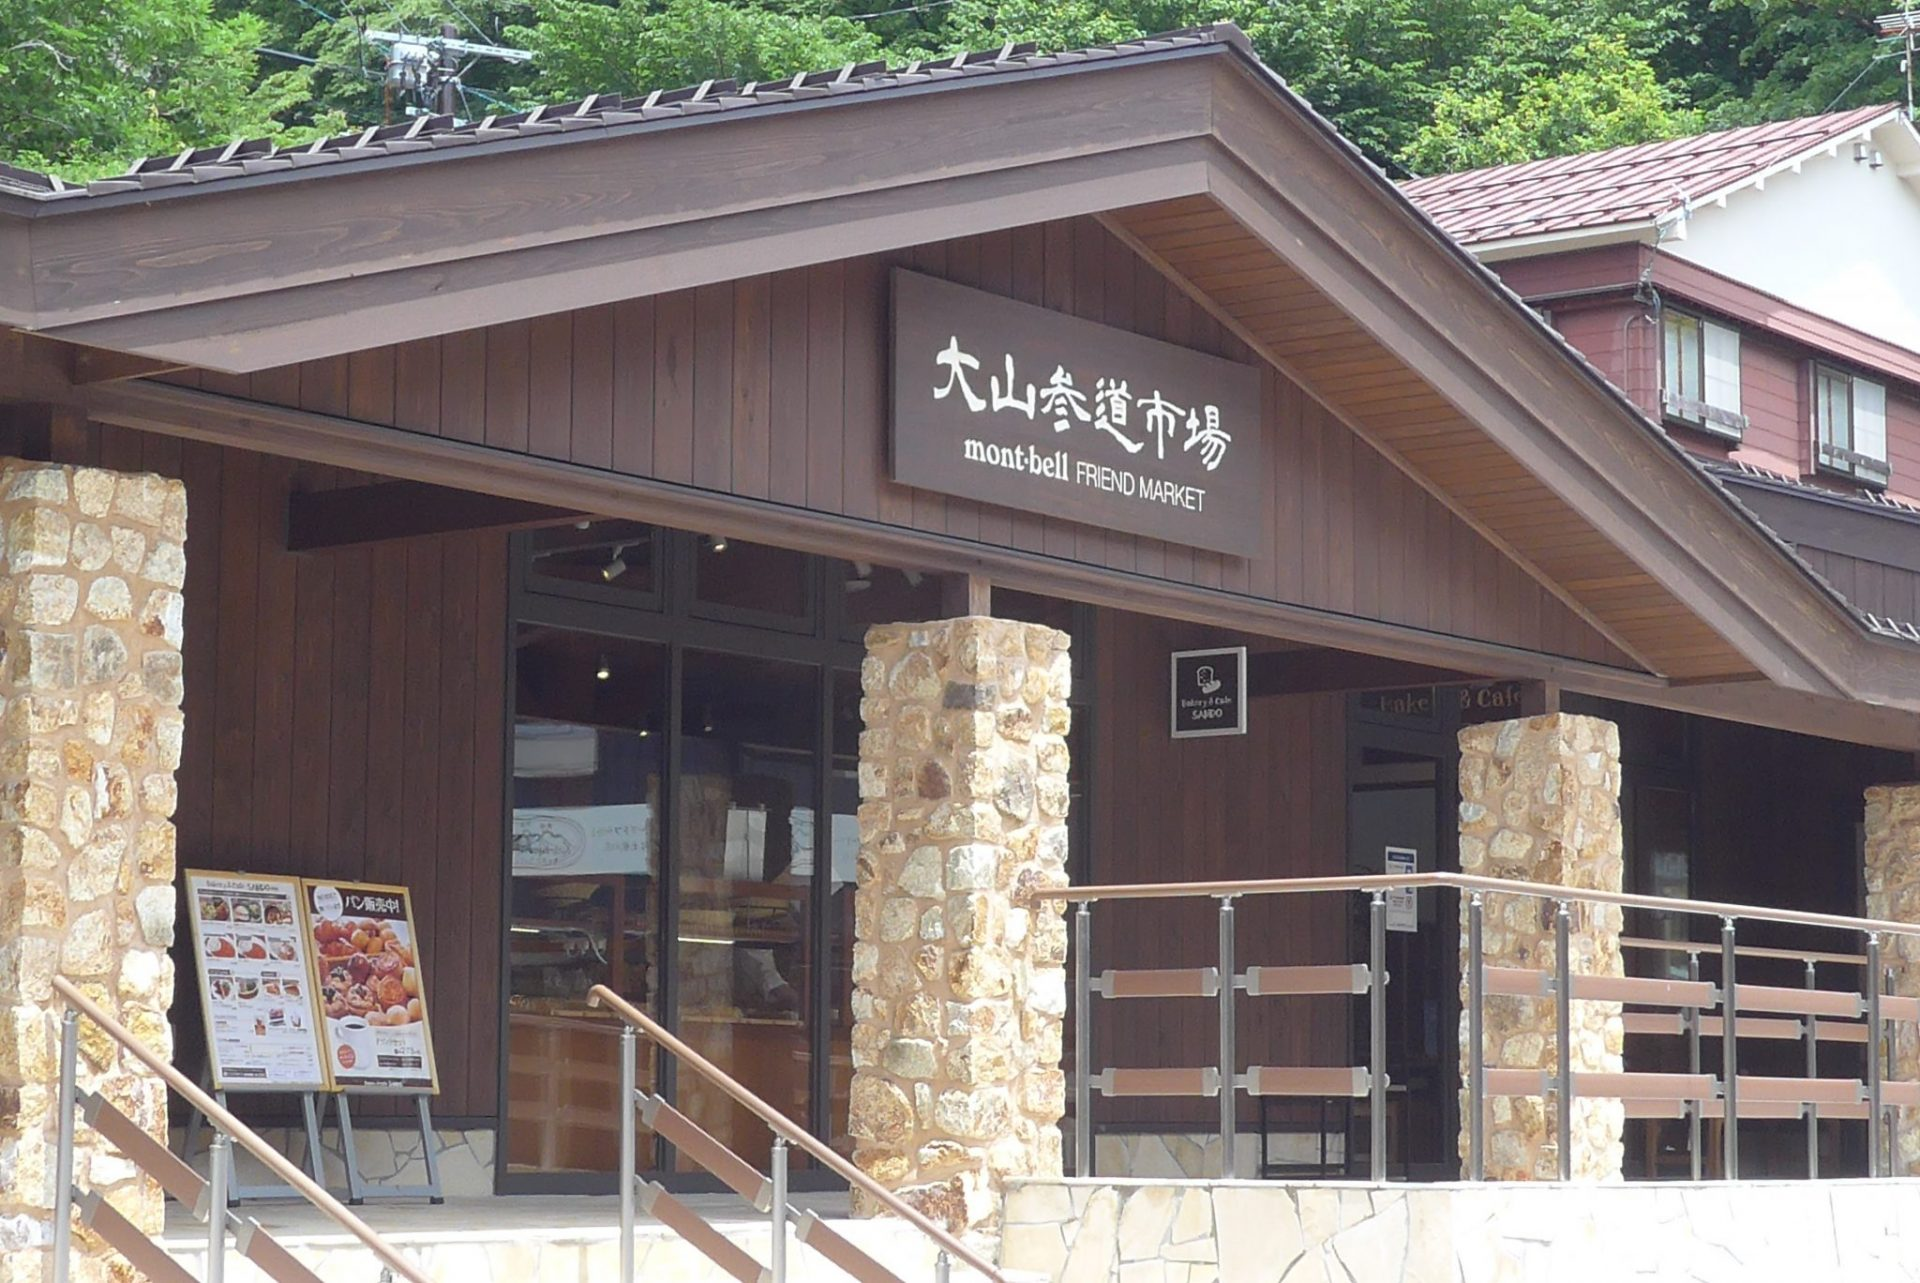 (K)鳥取県大山寺のアクセス!無料博労座駐車場から徒歩がおすすめ